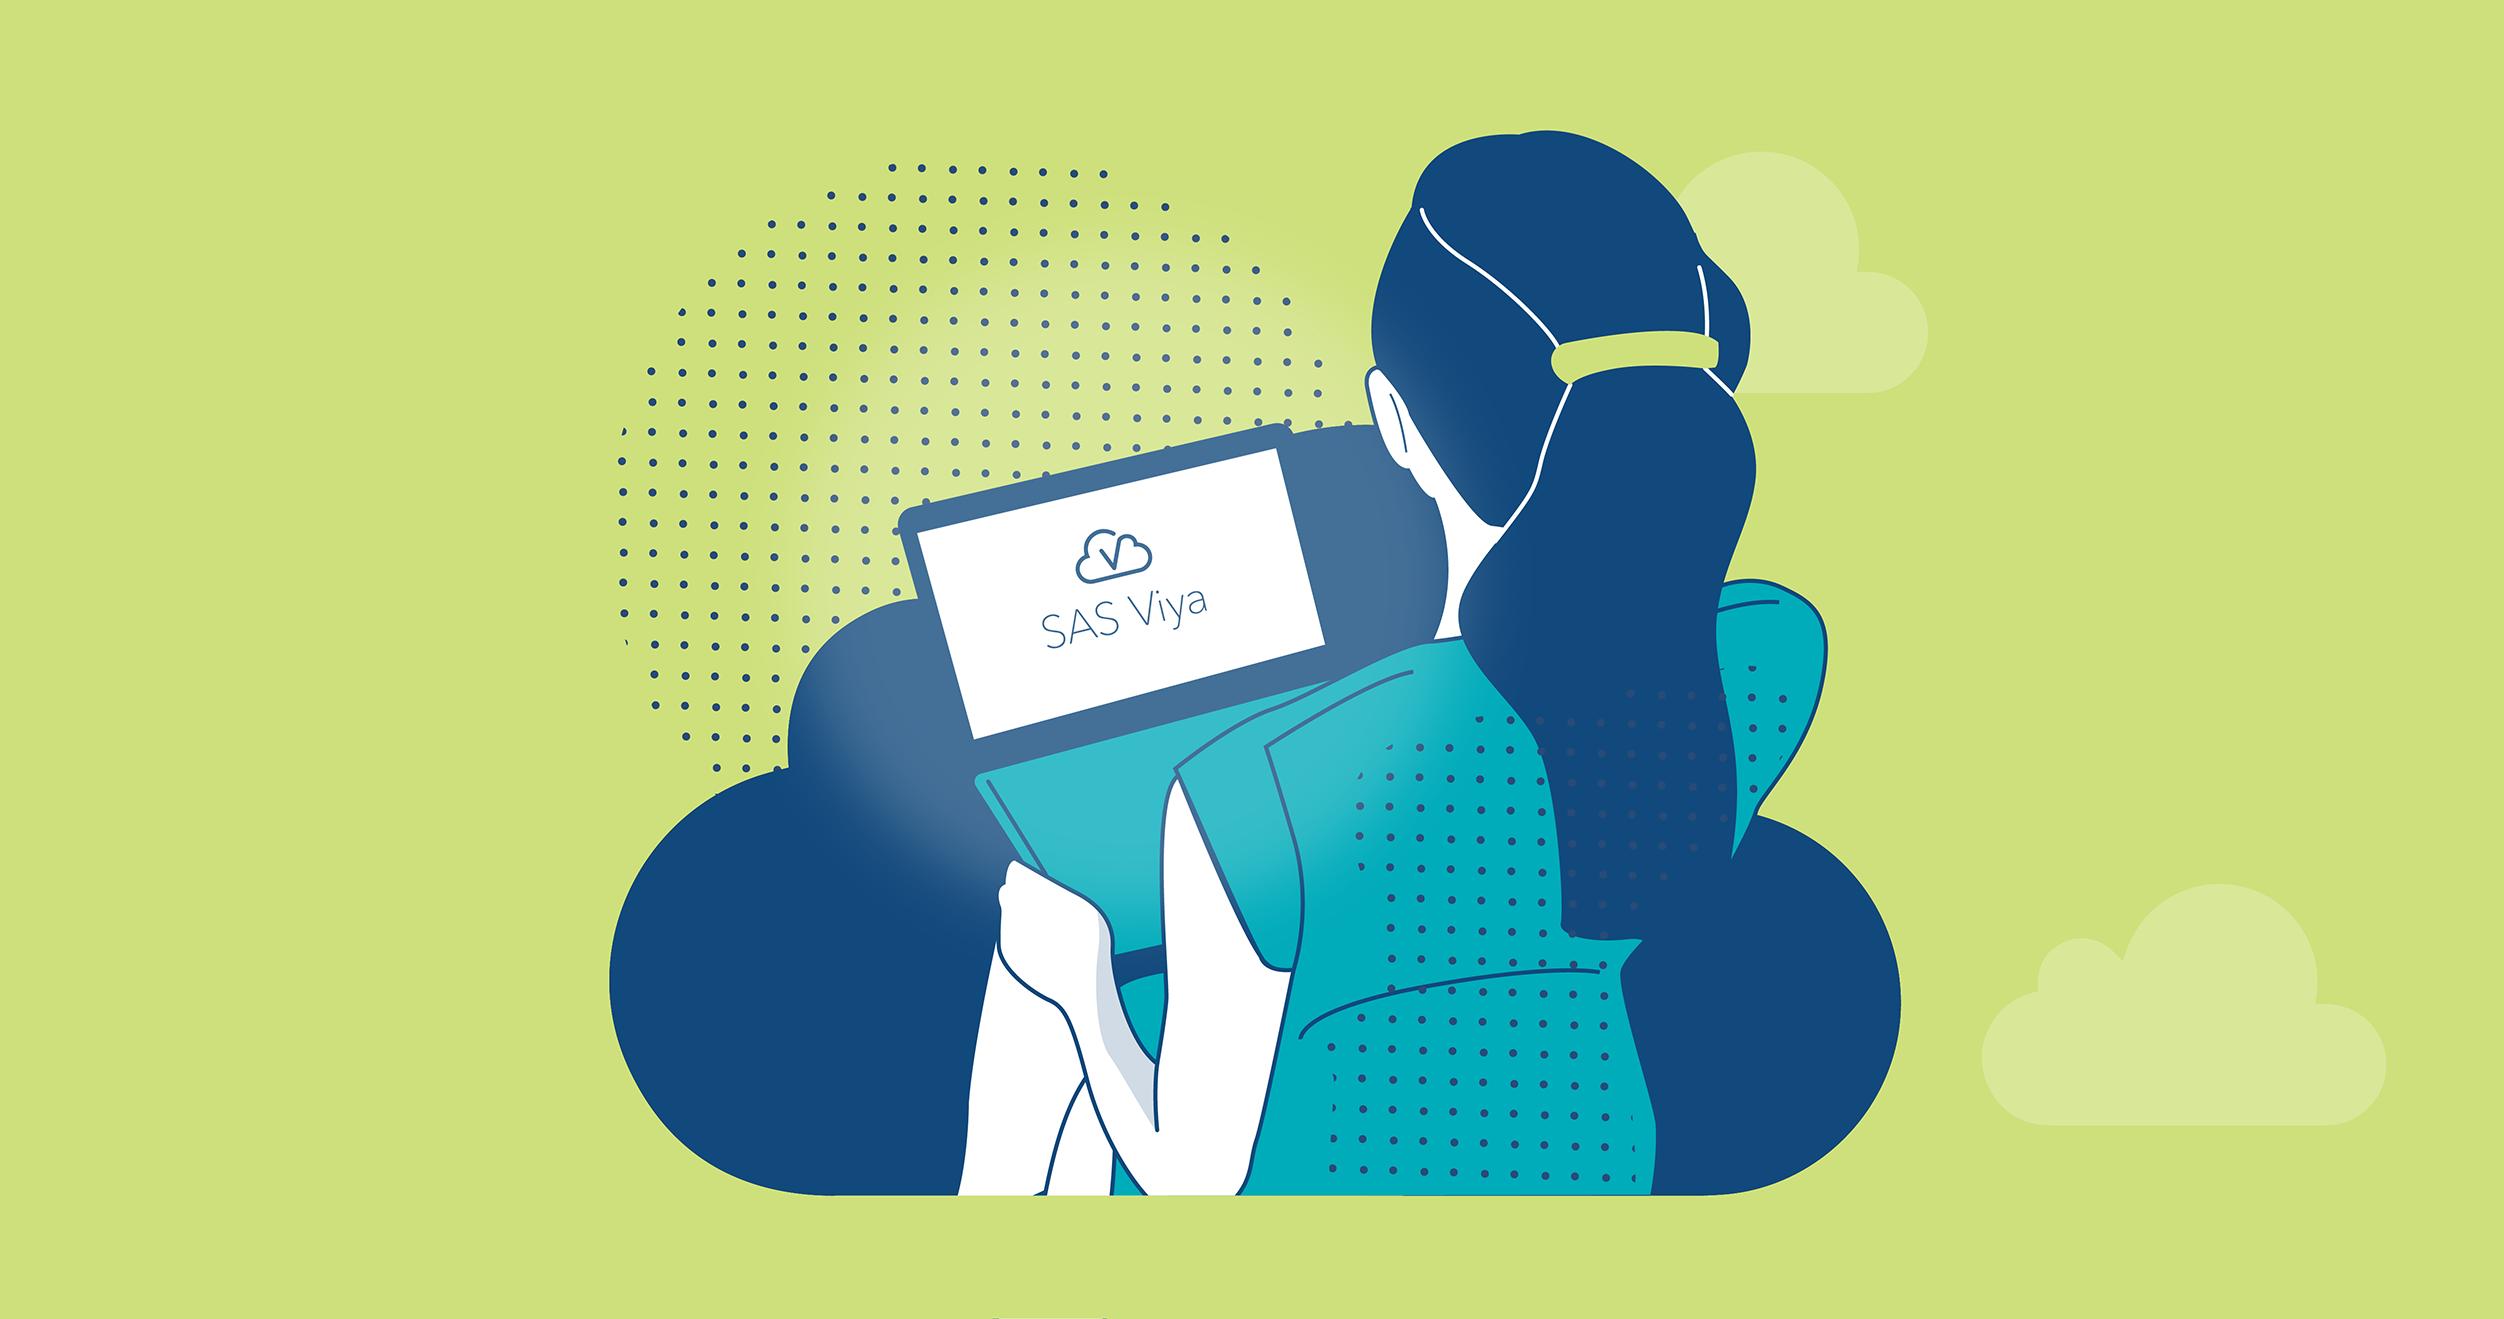 SAS Viya 4 ups its game with cloud-native approach